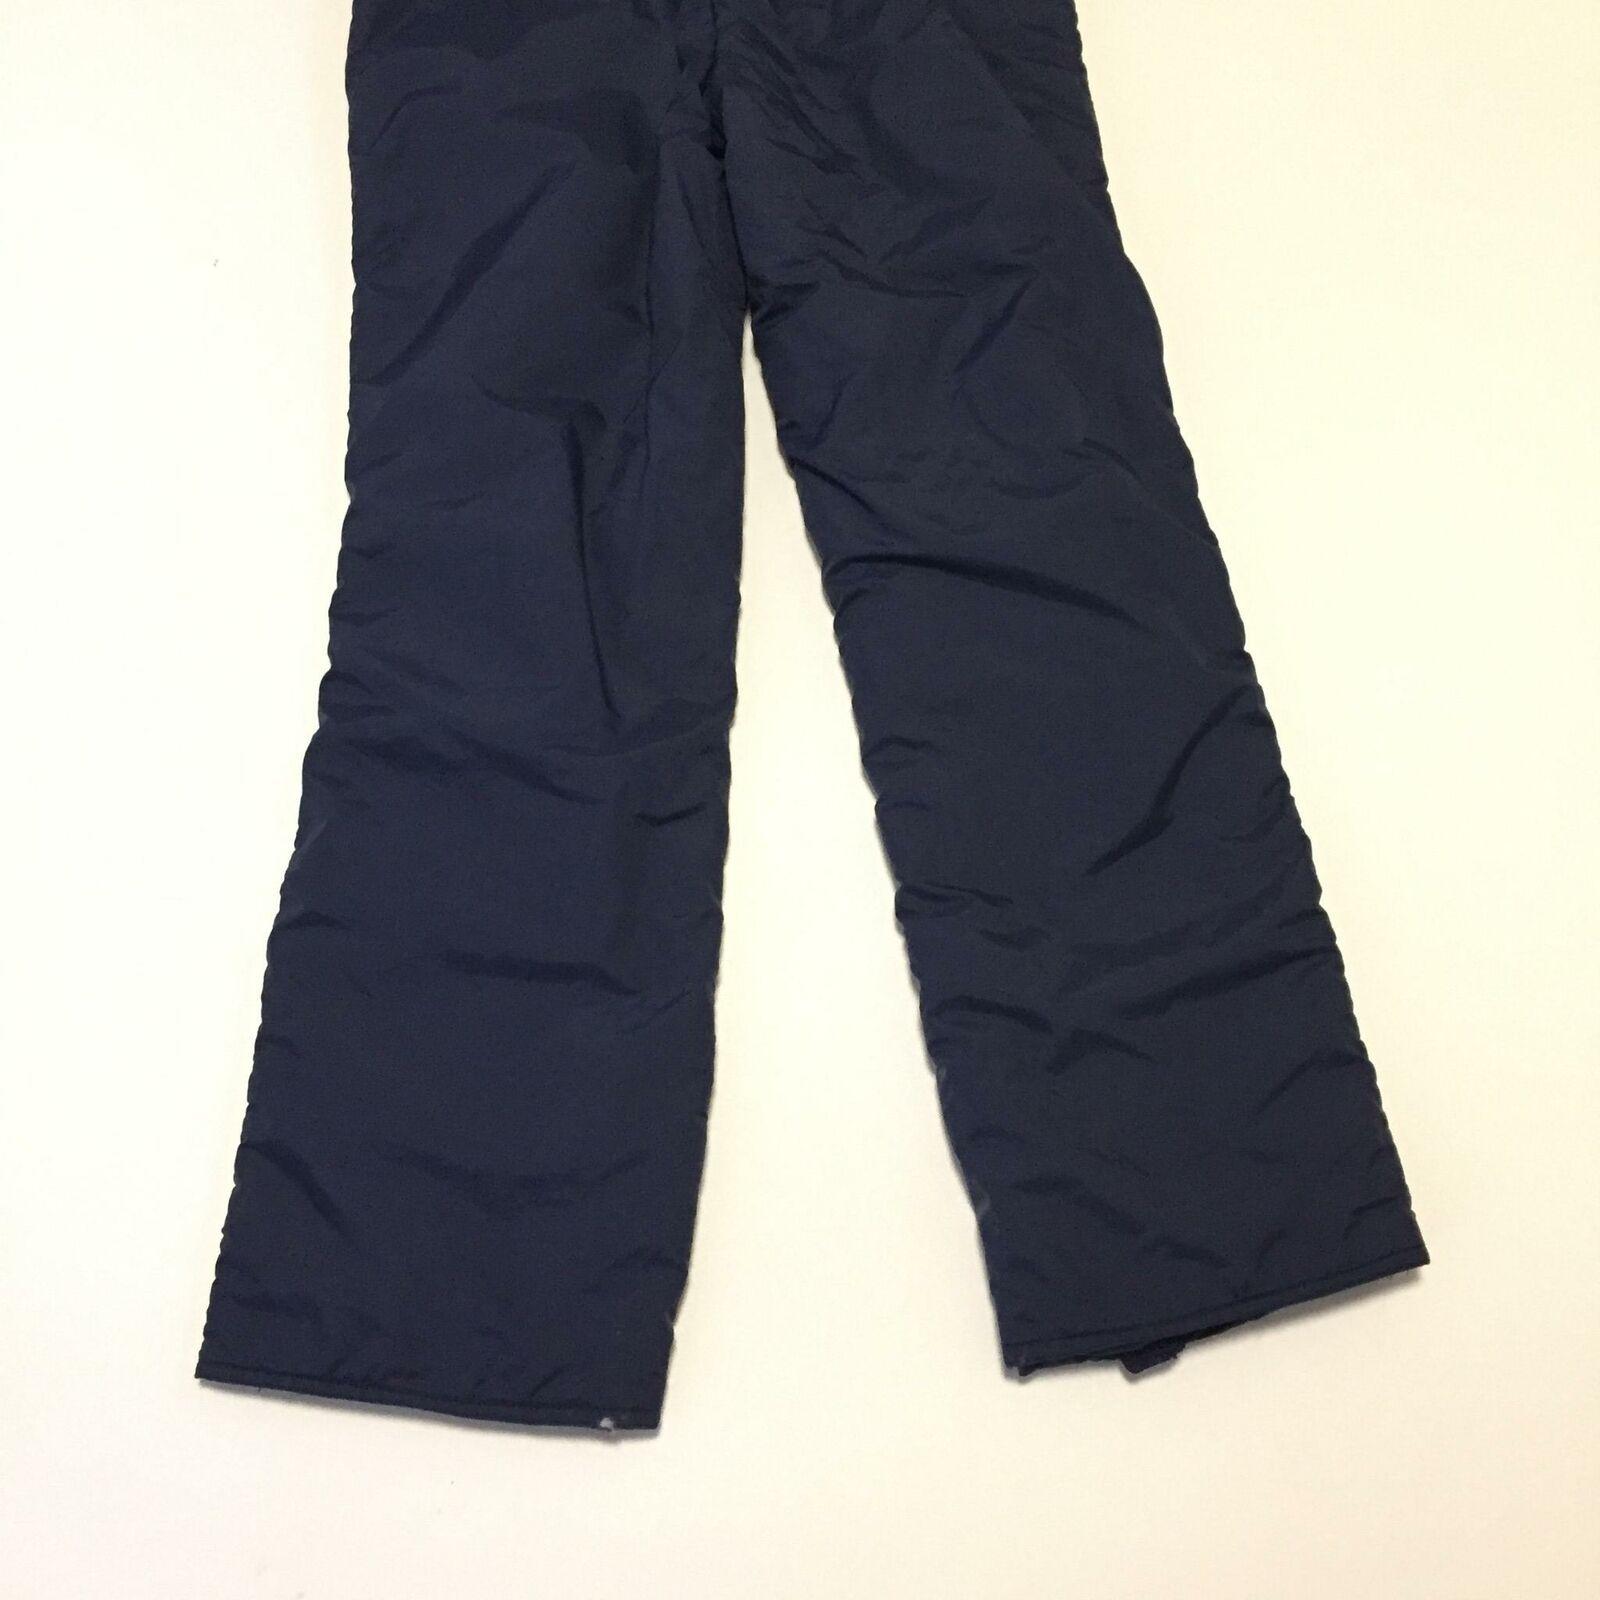 YT Sports Ladies 12 Ski Snow Pants Blue Bib Winter Outdoor Sports